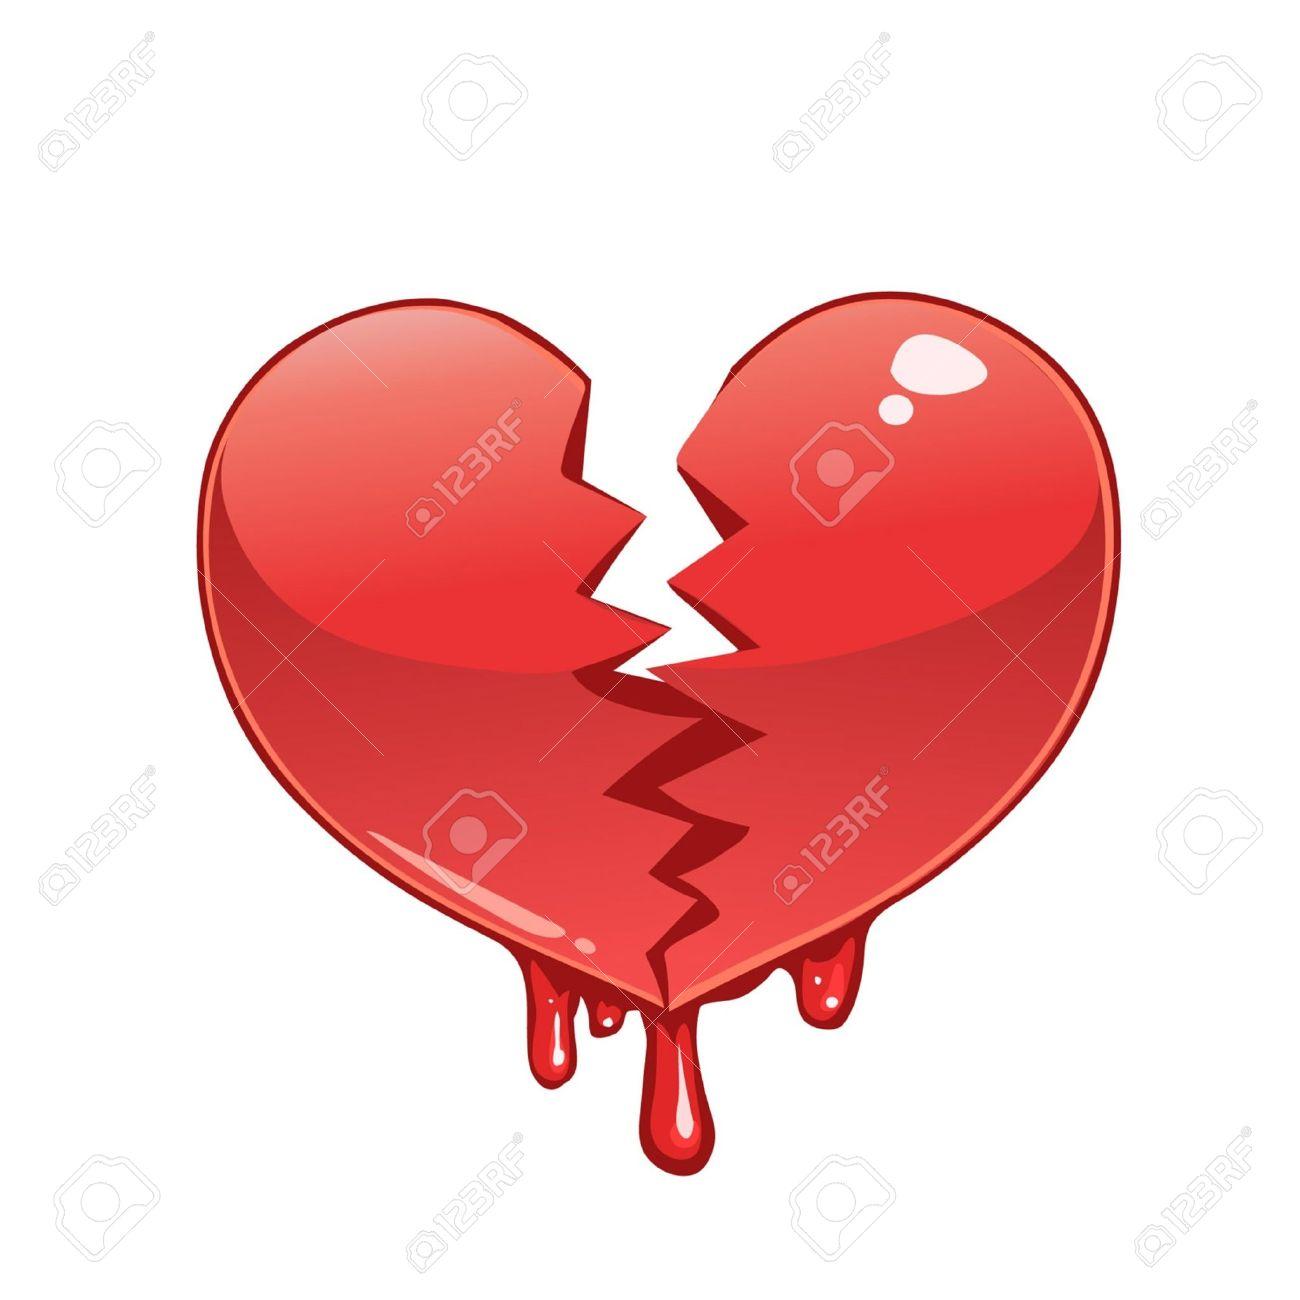 Broken and bleeding heart royalty free cliparts vectors and broken and bleeding heart stock vector 18809731 buycottarizona